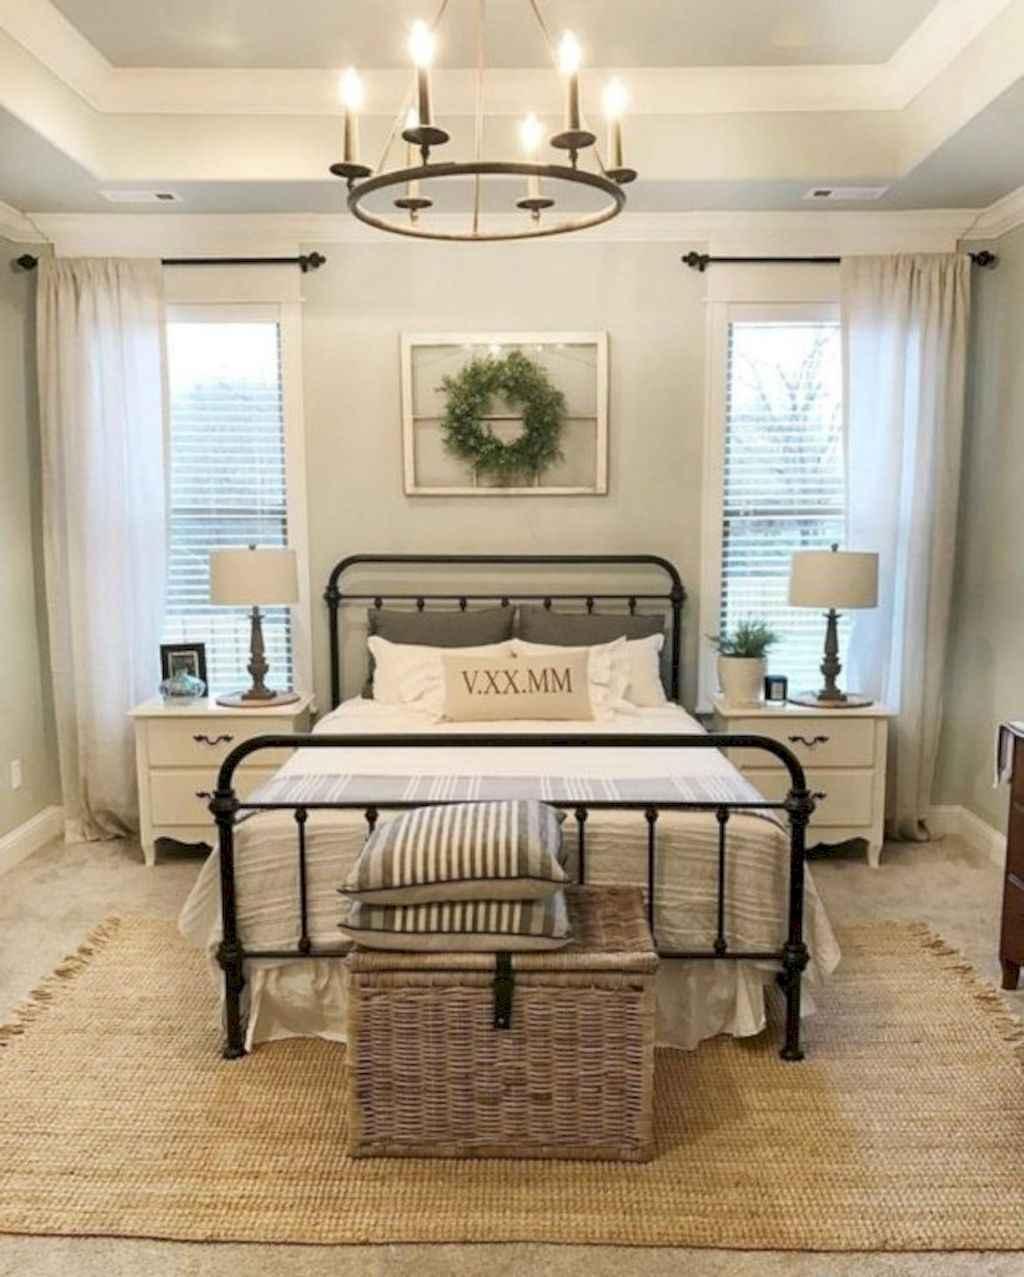 100 Stunning Farmhouse Master Bedroom Decor Ideas (89)